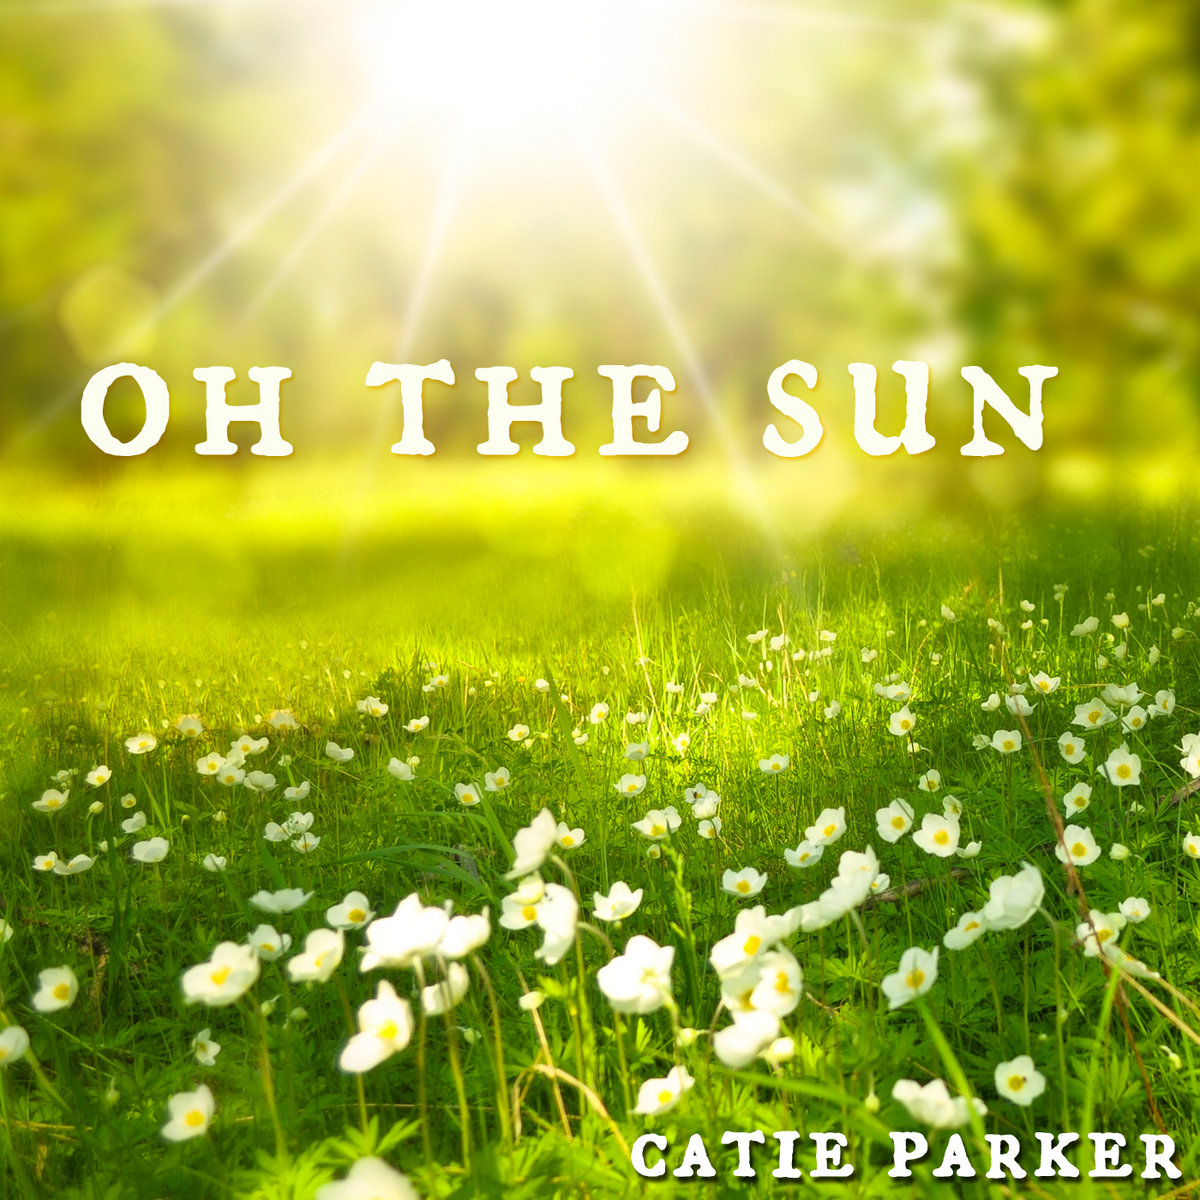 Catie Parker Nude Photos 1